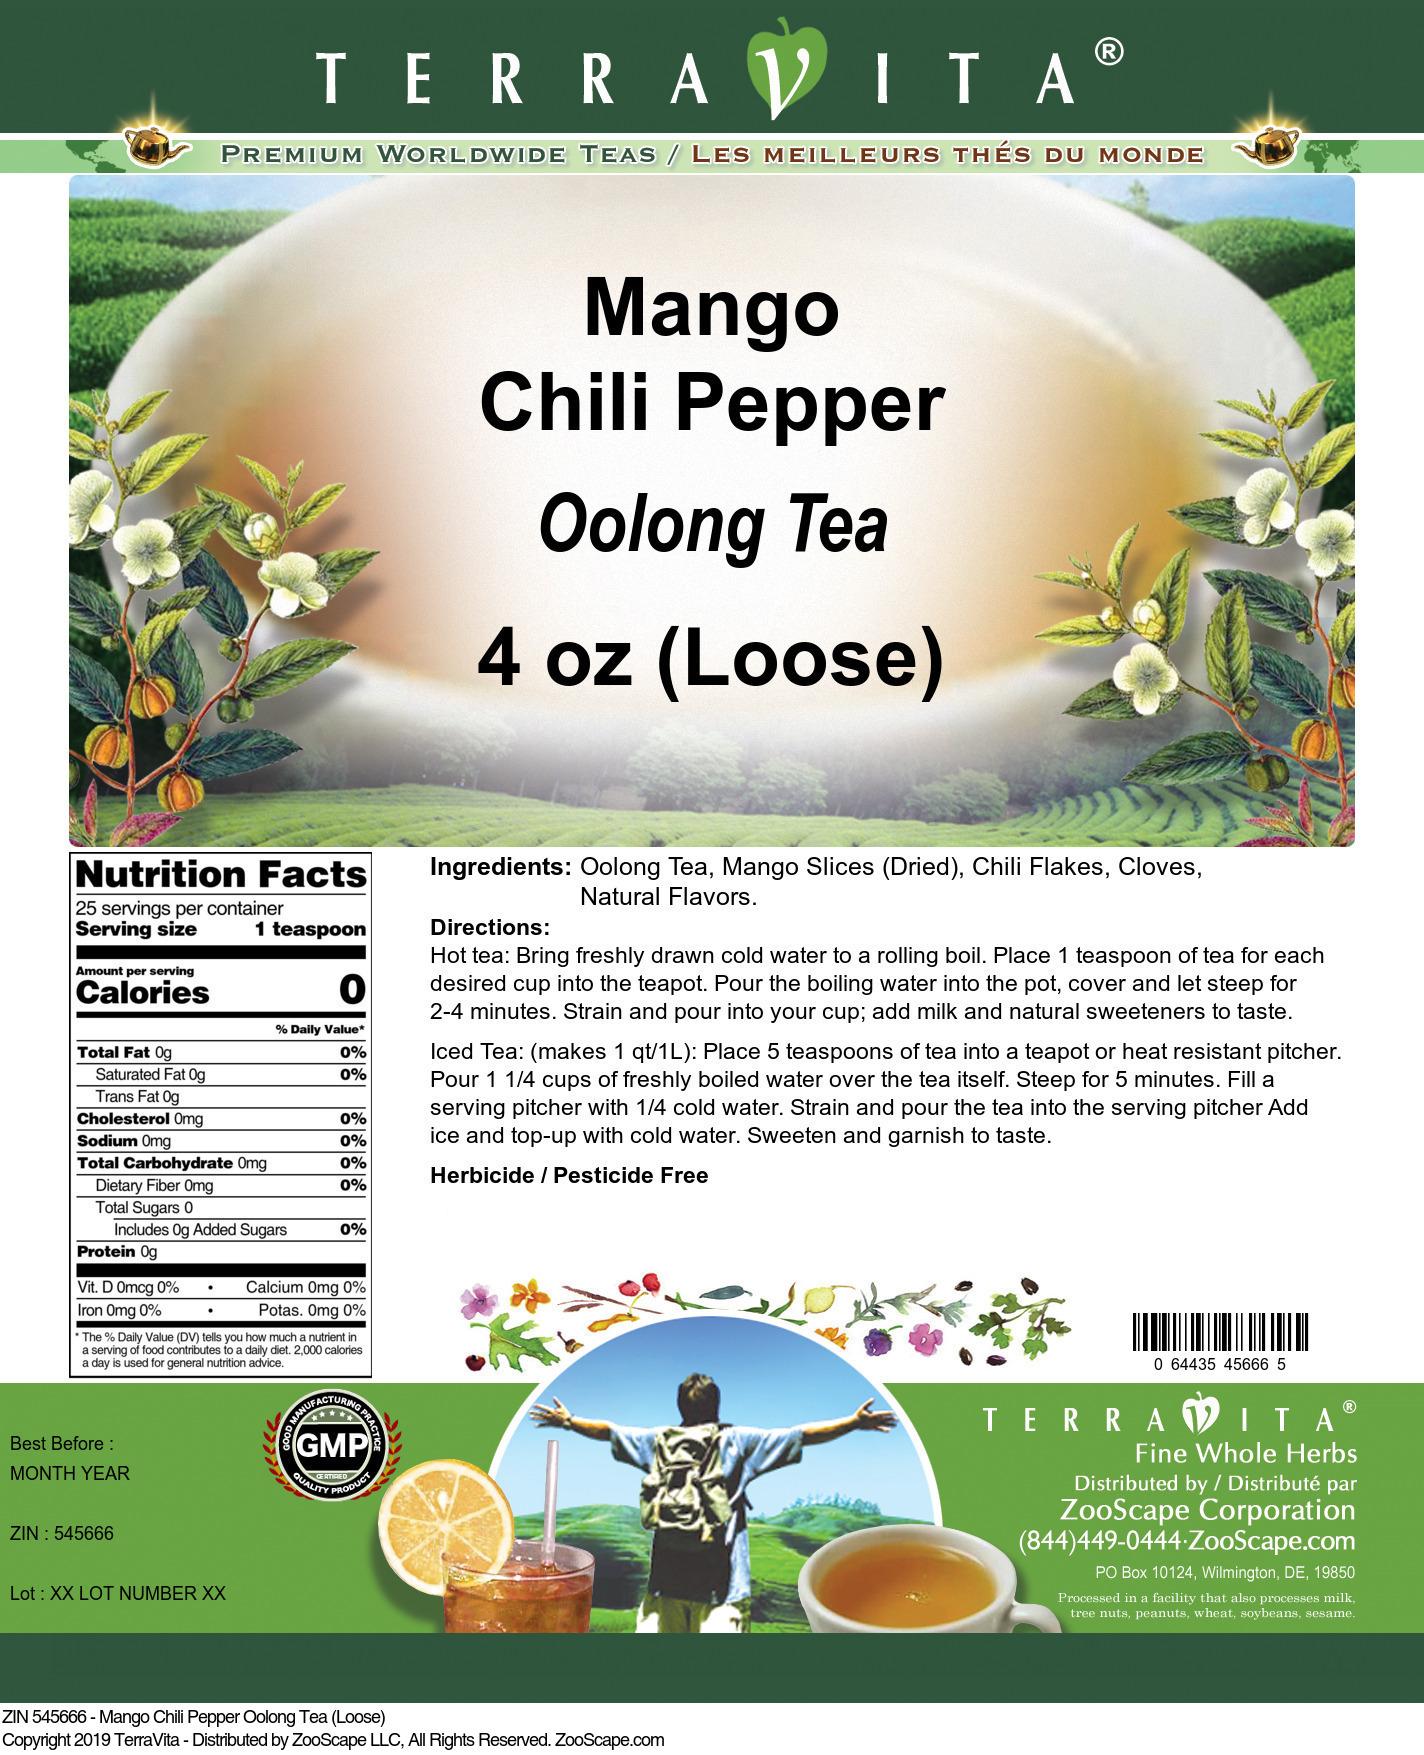 Mango Chili Pepper Oolong Tea